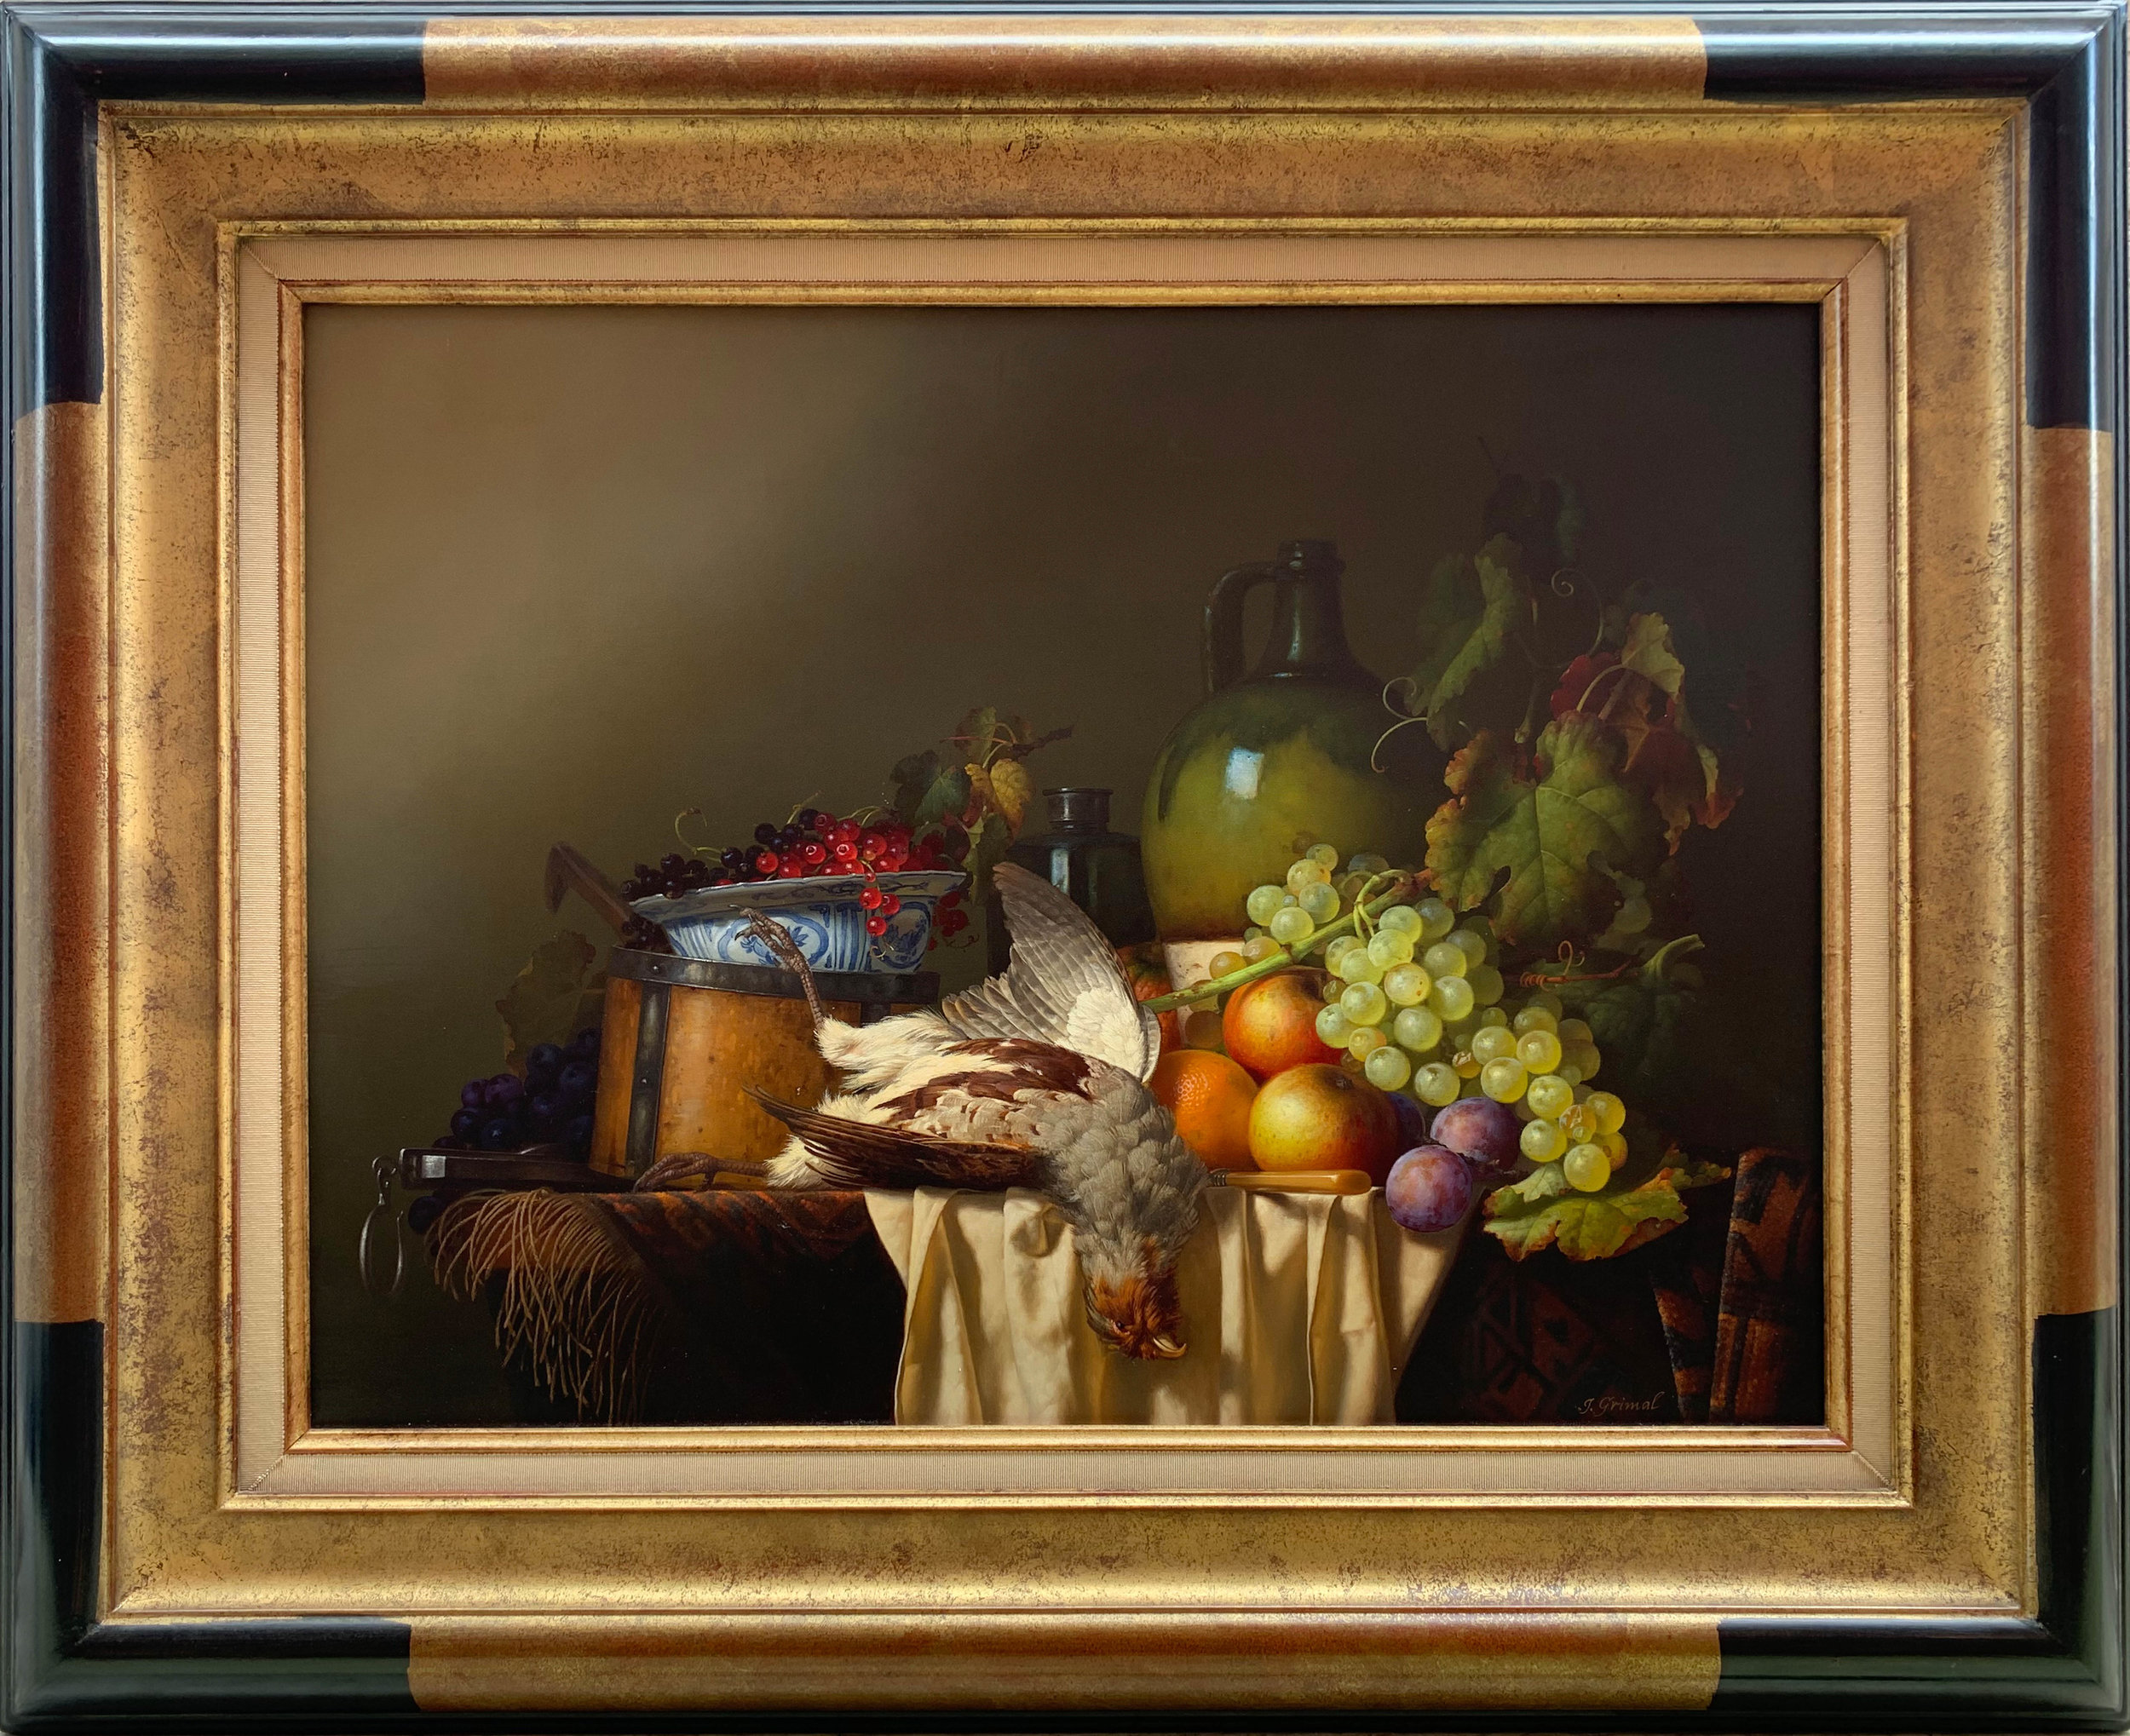 Composition des Fruits en Faison  oil , 32.5 x 26 in. framed